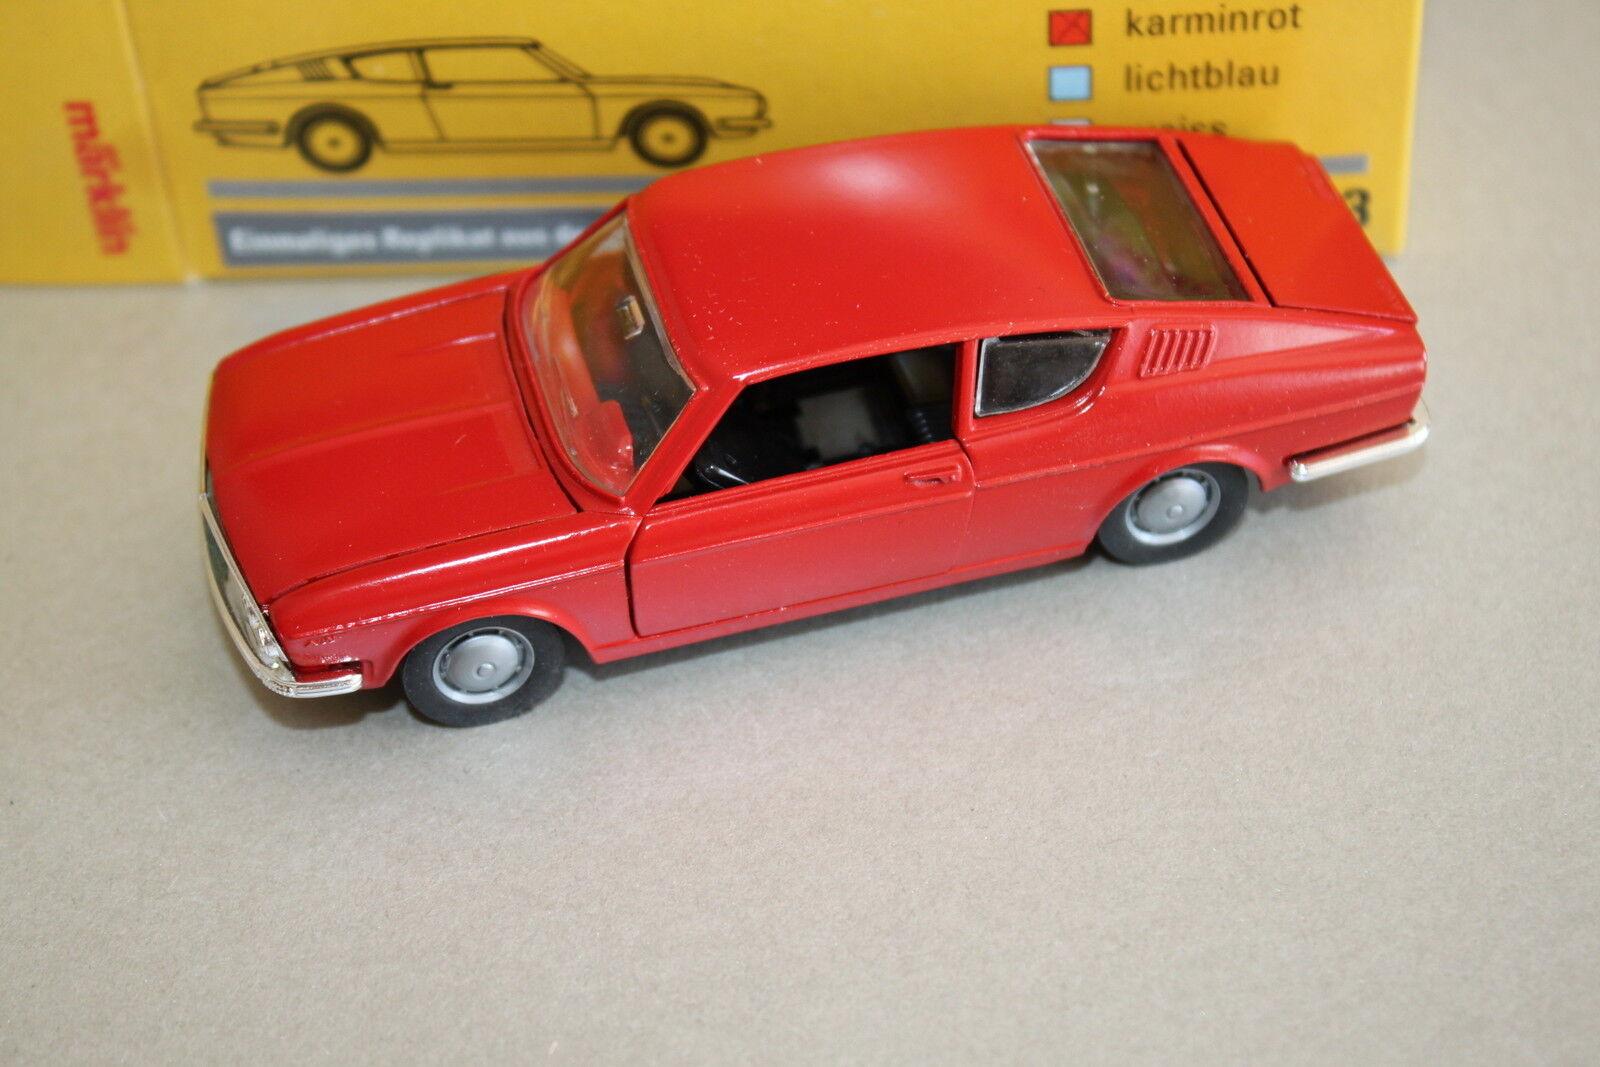 Märklin 18103-03 Modellauto Audi 100 Coupé 1 43 in Farbvarianten OVP    Qualitativ Hochwertiges Produkt